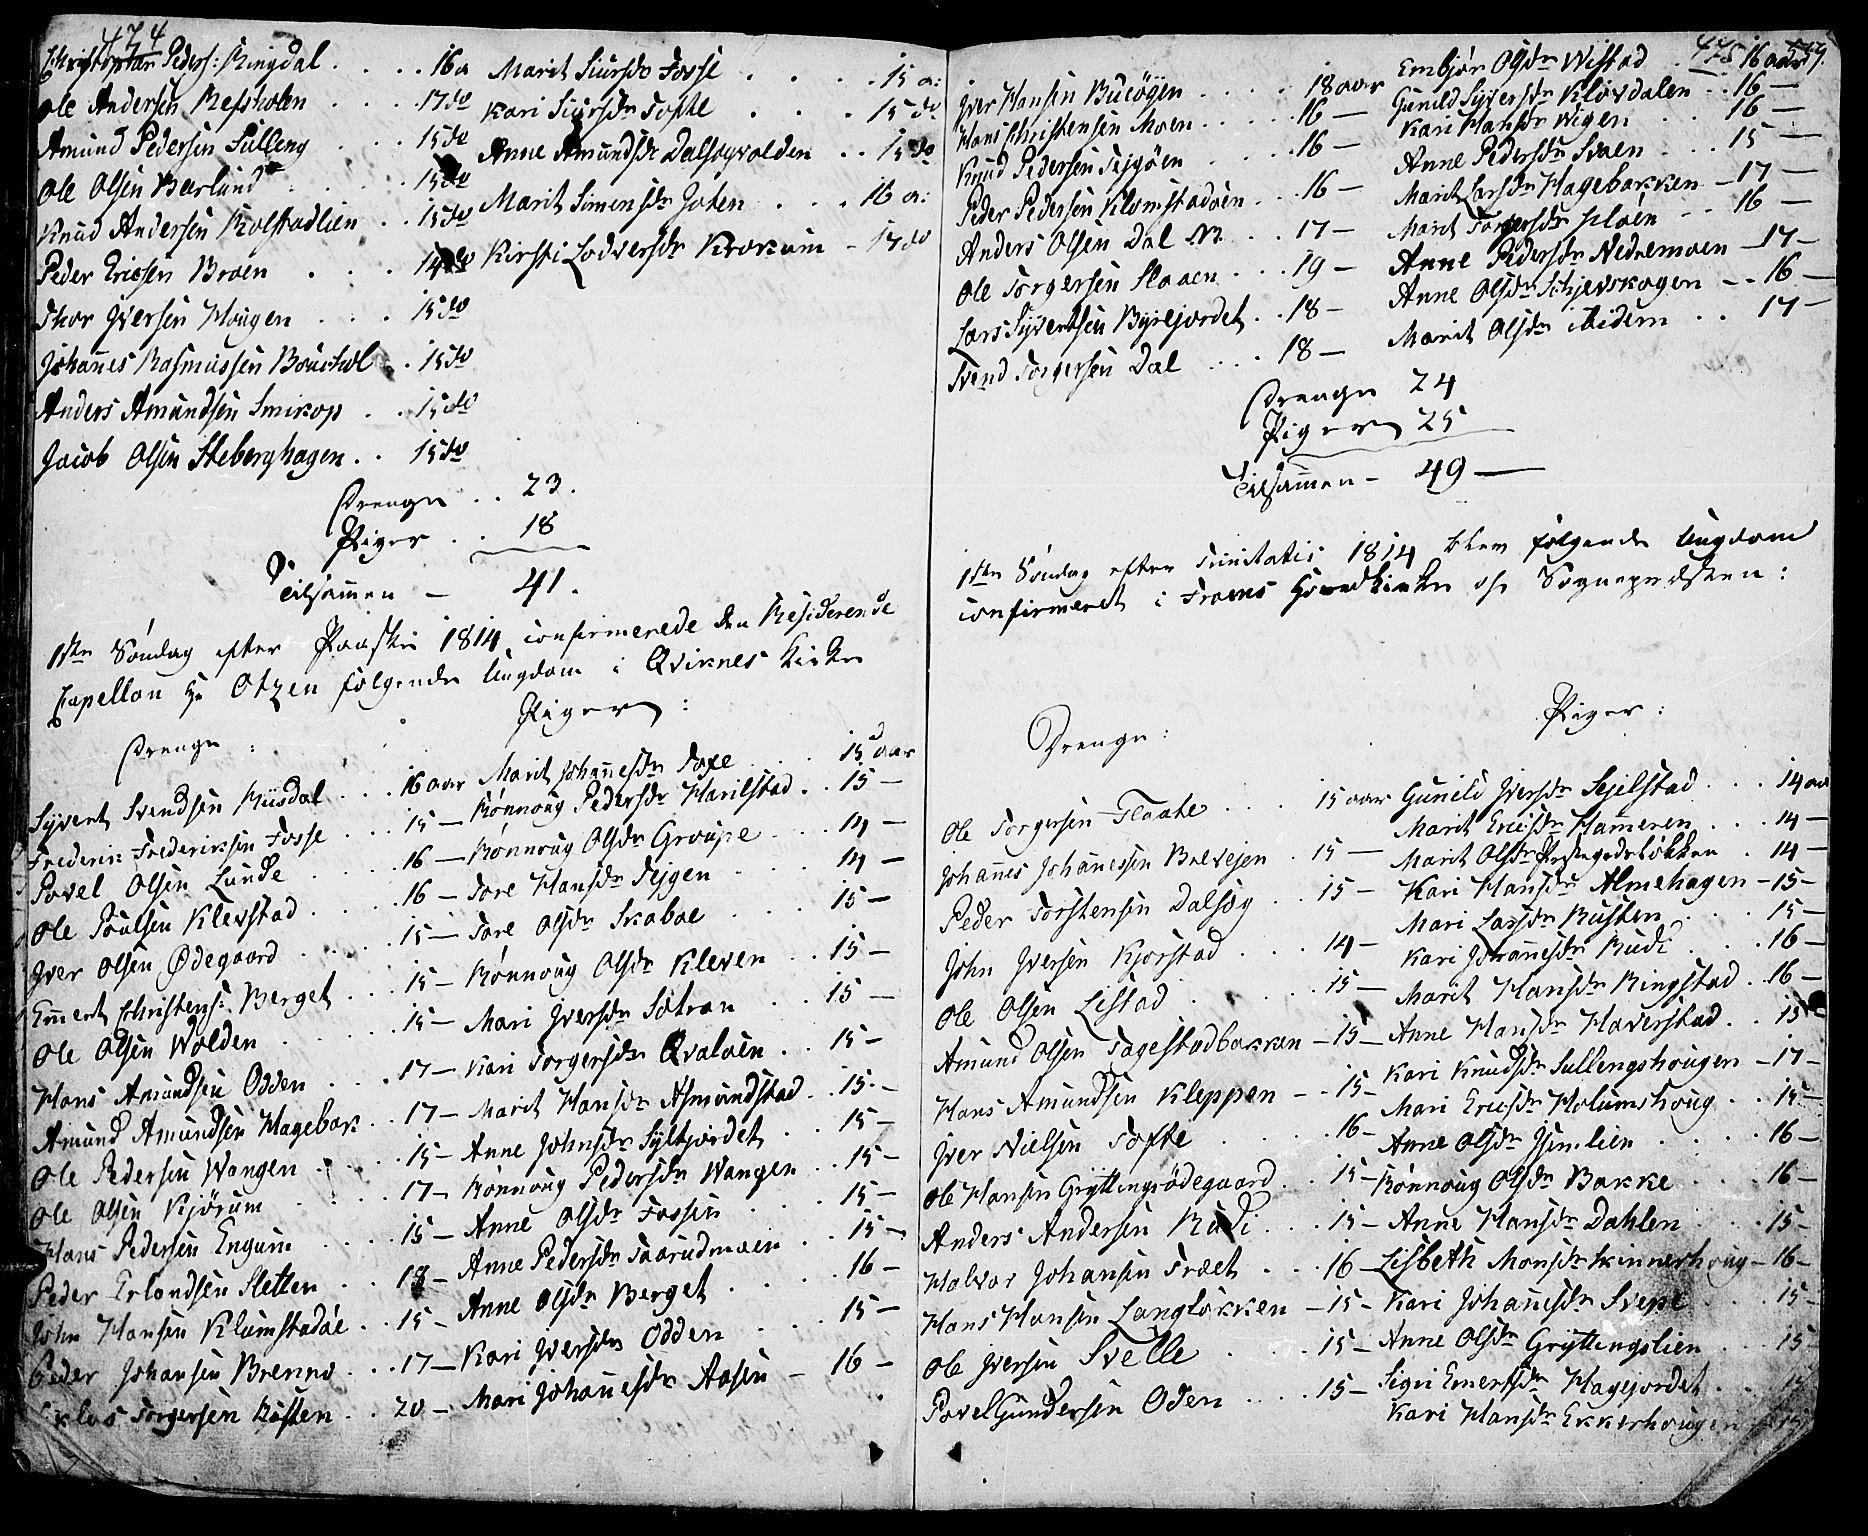 SAH, Fron prestekontor, H/Ha/Haa/L0001: Ministerialbok nr. 1, 1799-1816, s. 474-475